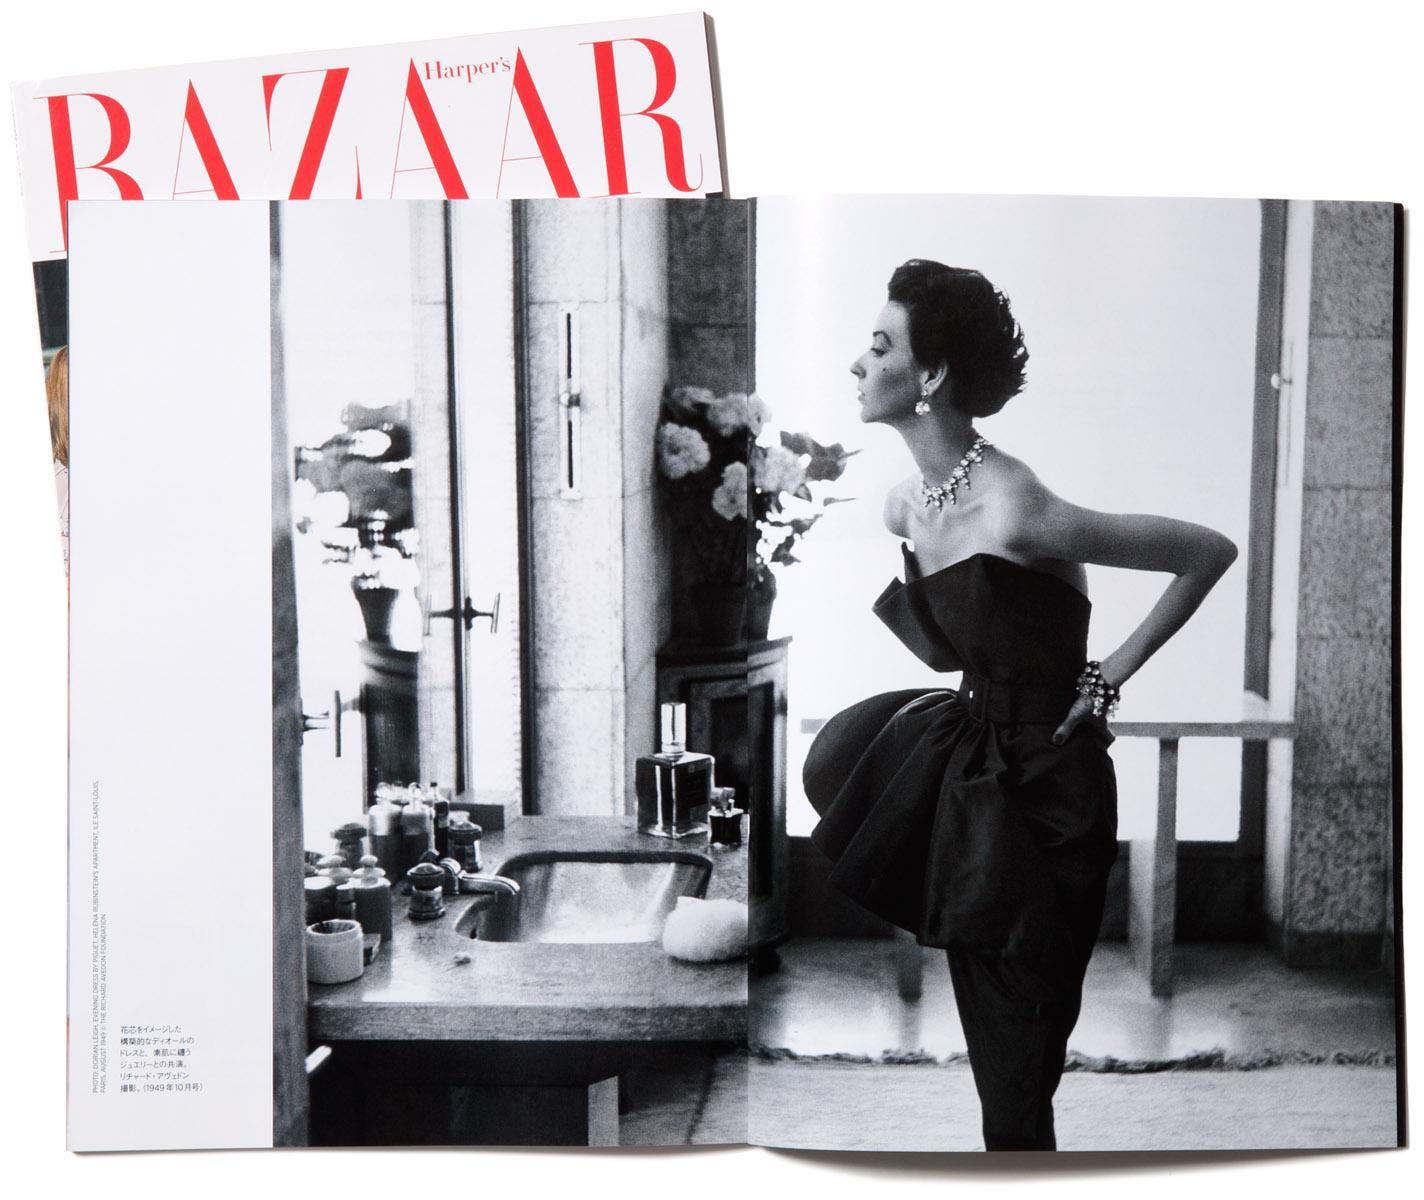 Harper's Bazaar Japan, January 2015, Image by Richard Avedon, 1949